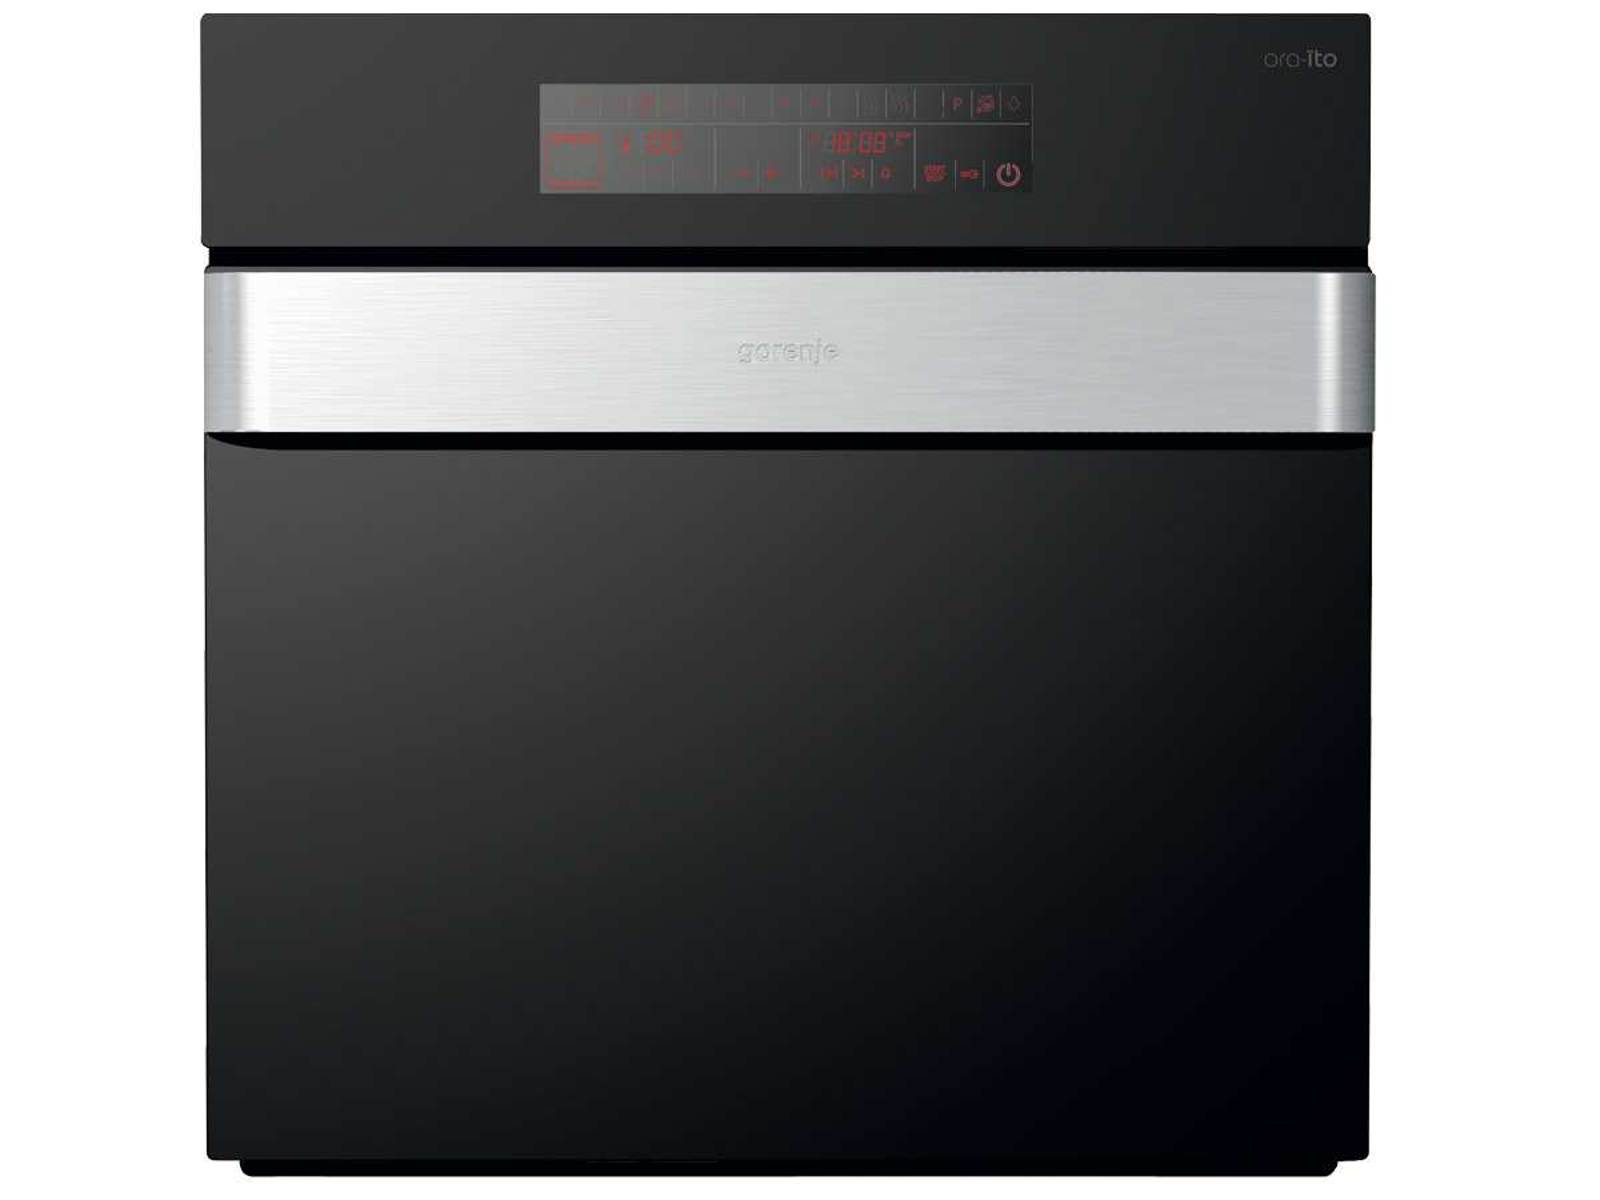 Siemens Kühlschrank Ventilator Reinigen : Smeg kühlschrank ventilator reinigen kühl gefrierkombination